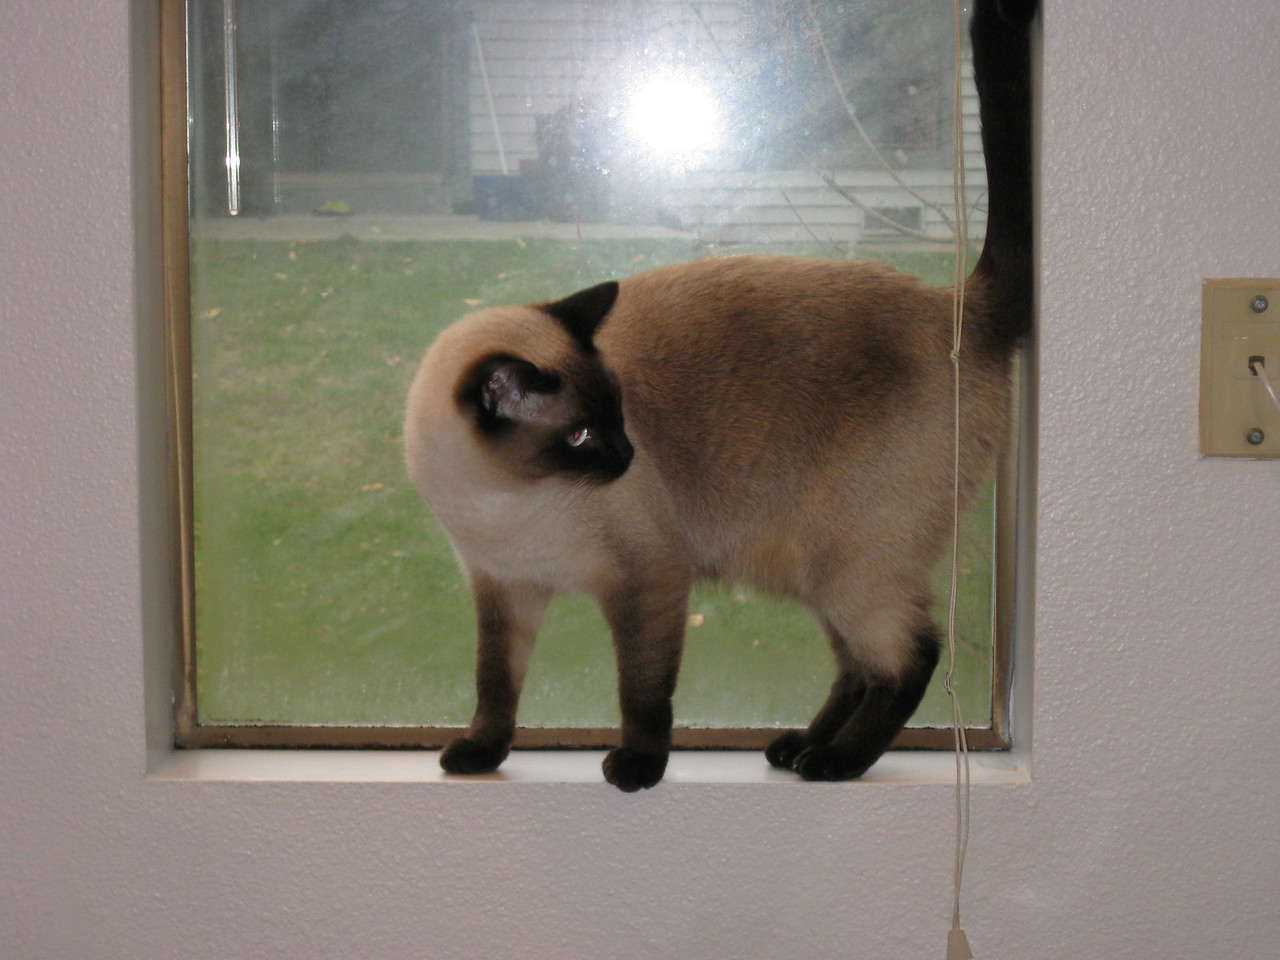 Kitchen windows rule